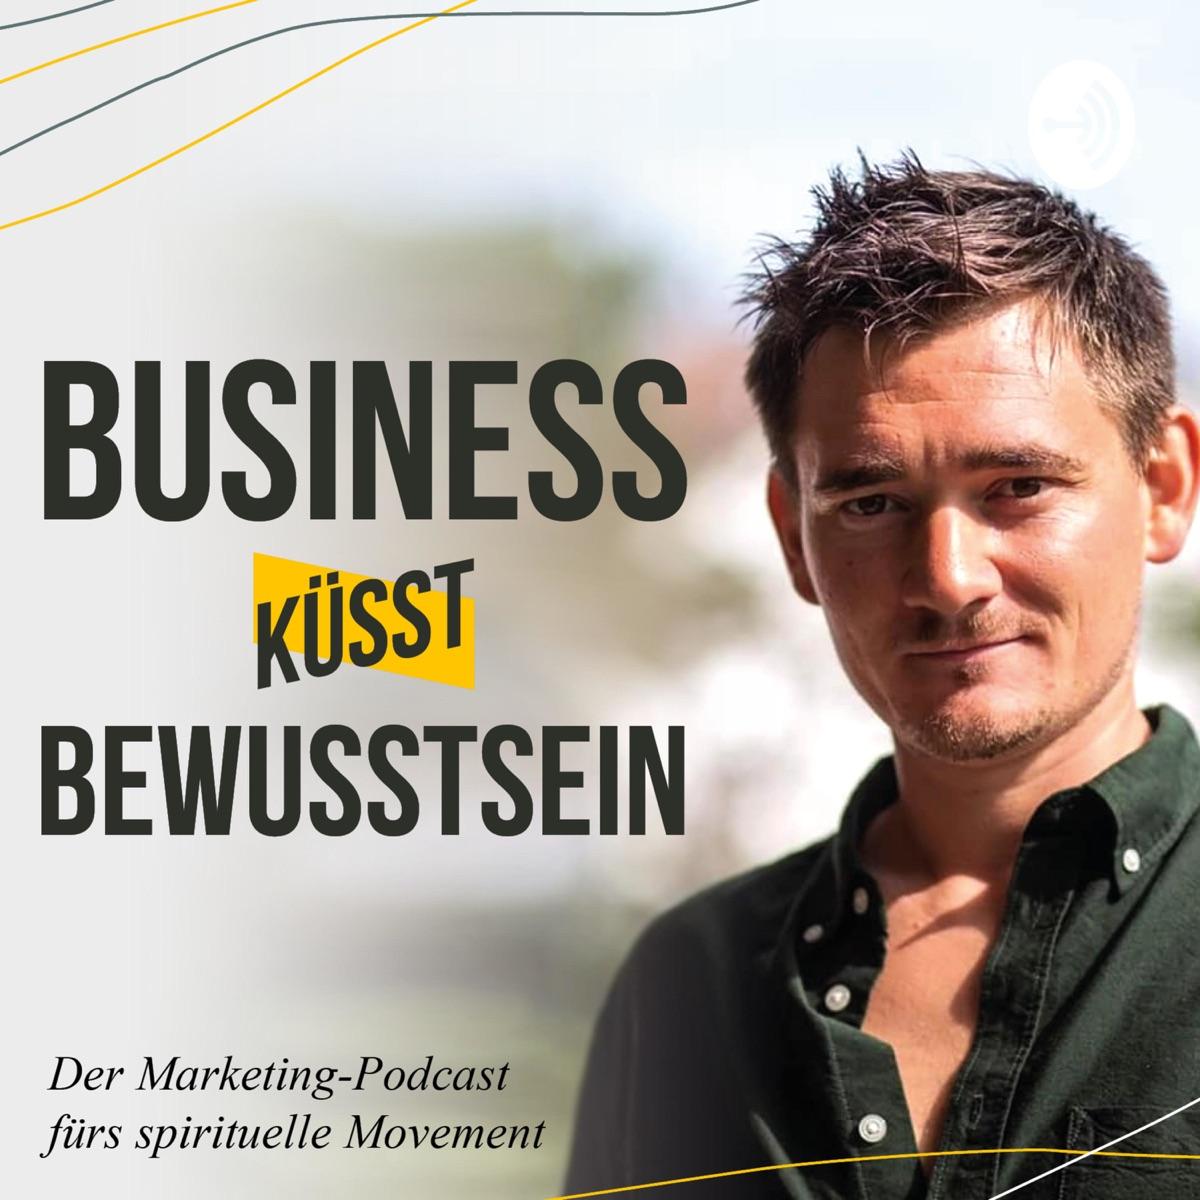 Lerne Storytelling - Business küsst Bewusstsein